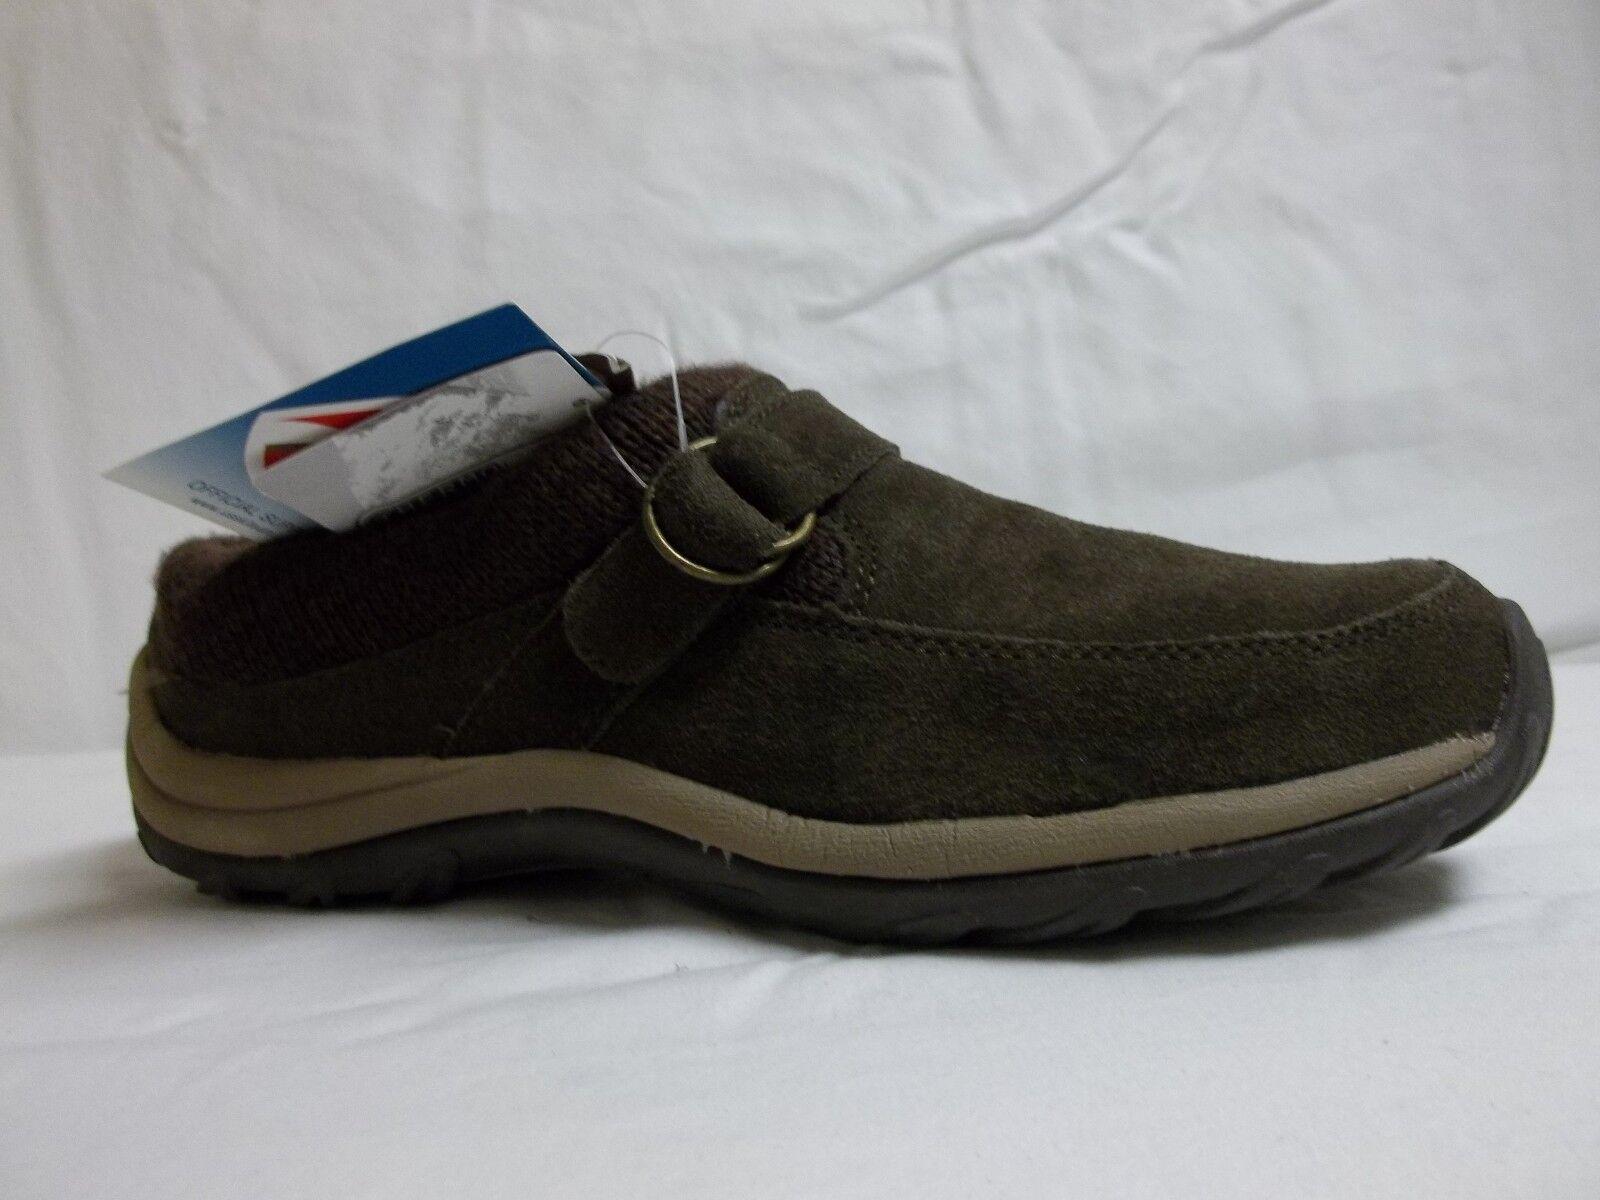 Khombu Größe 7.5 M Cloud2 Braun Leder Loafers NEU Damenschuhe Schuhes NWOB